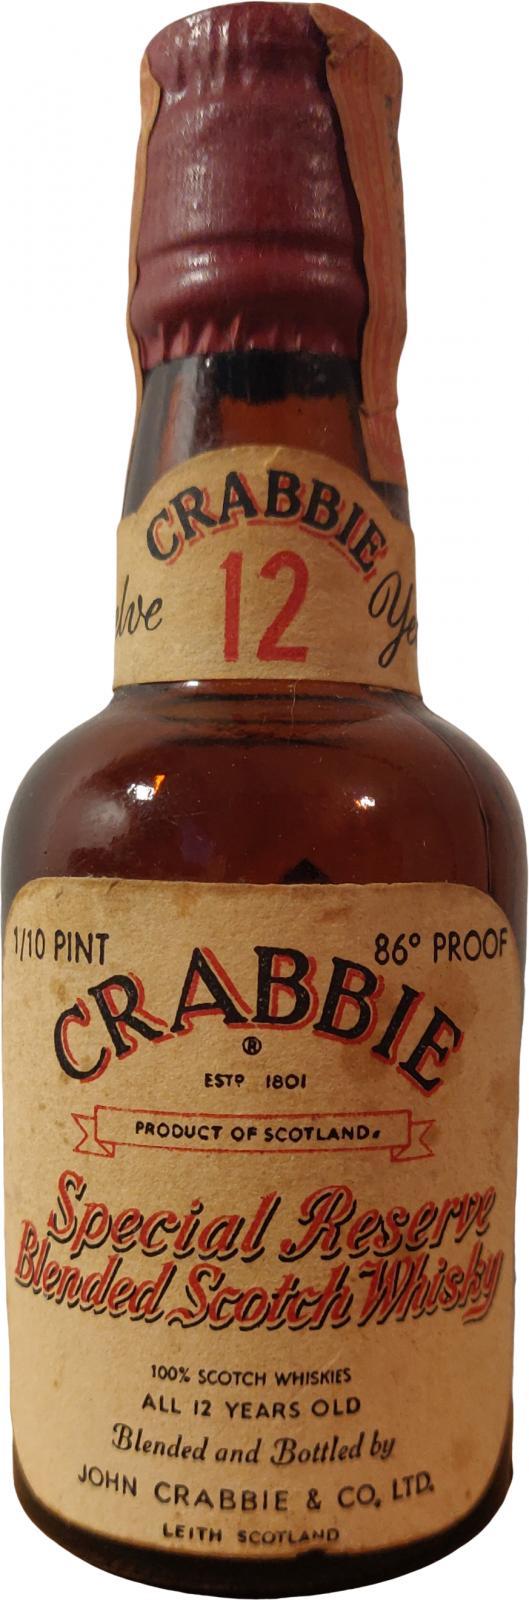 Crabbie 12-year-old JCrC